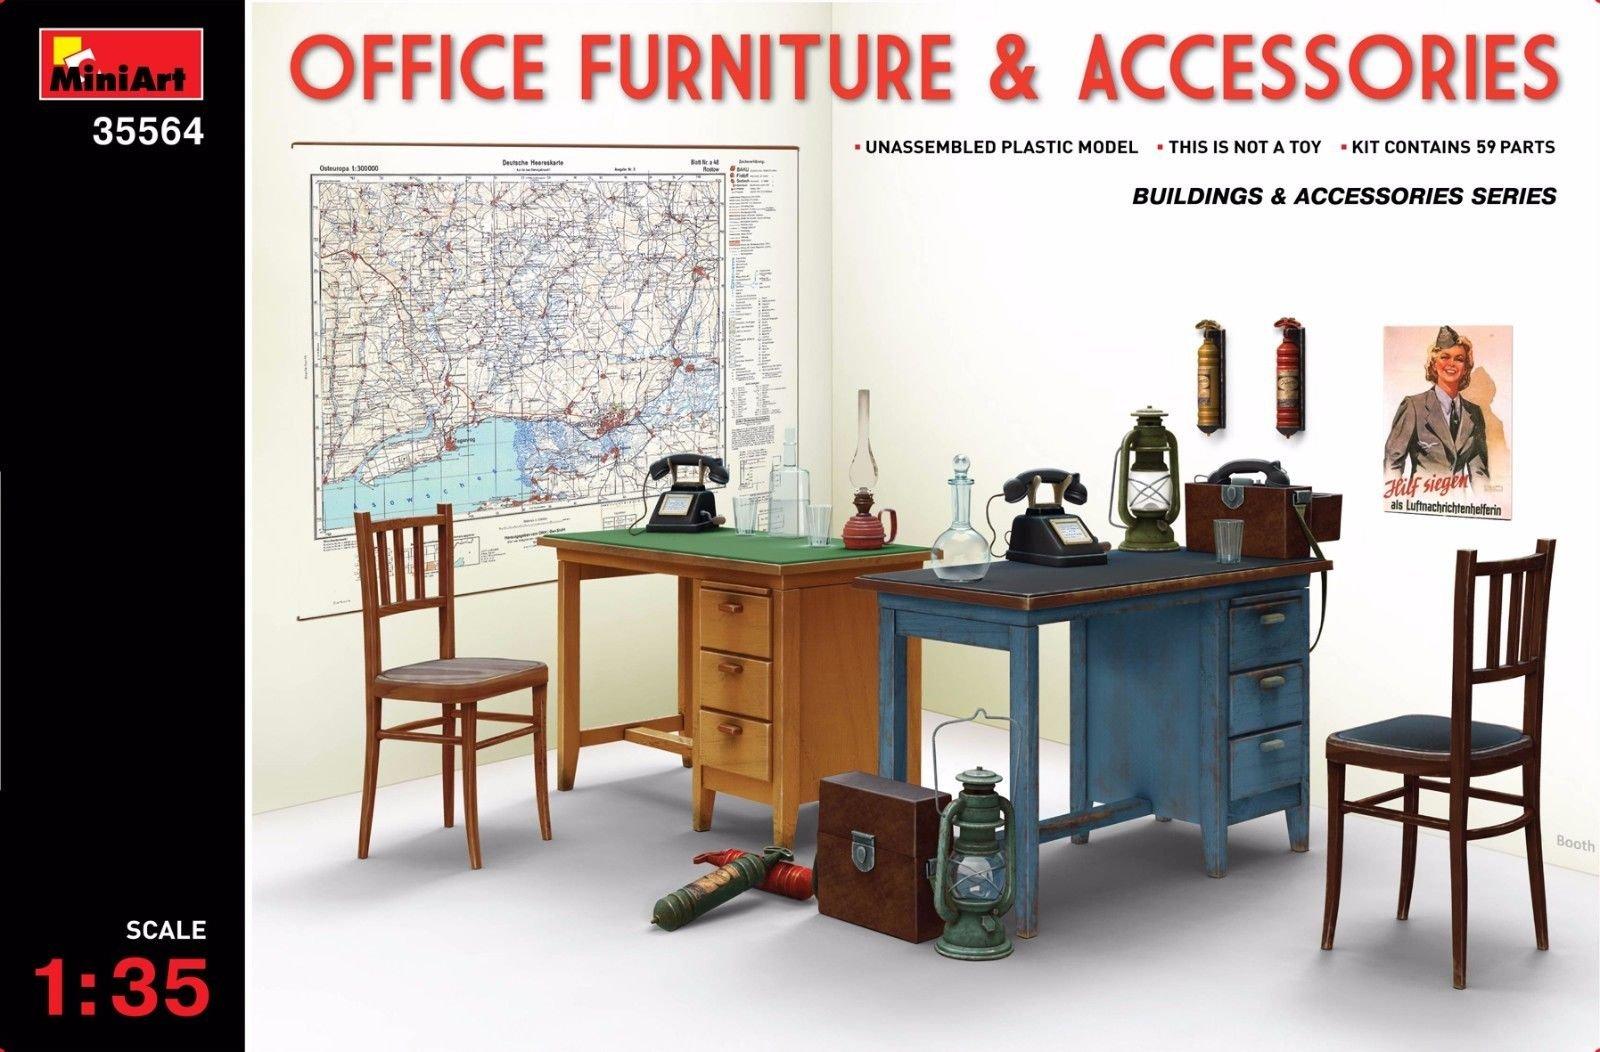 OFFICE FURNITURE & ACCESSORIES 1/35 MINIART 35564